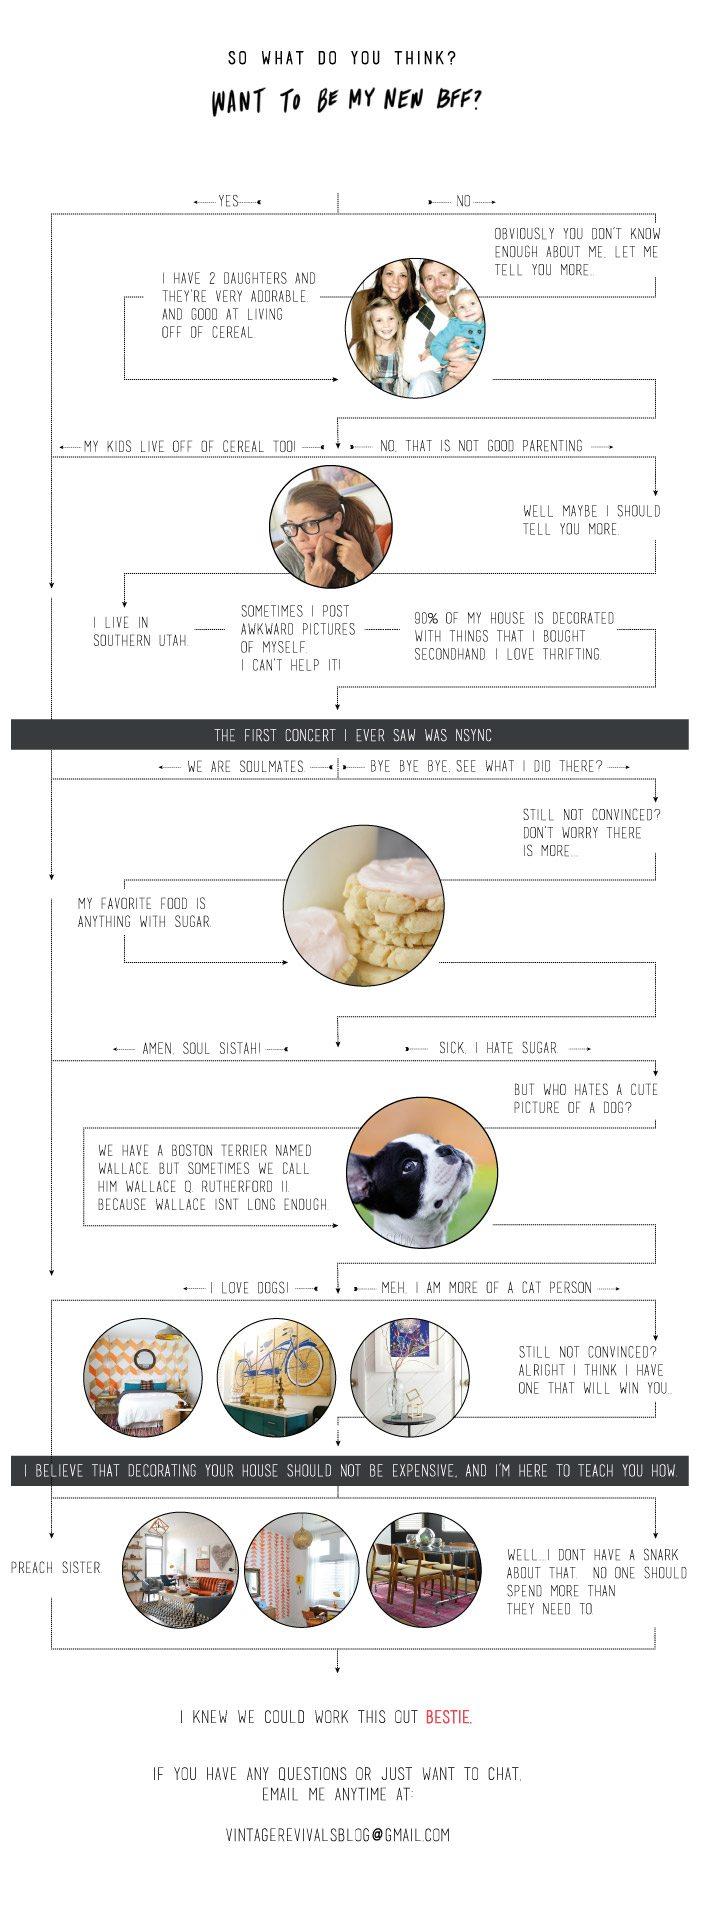 about_vintage_revivals_infographic